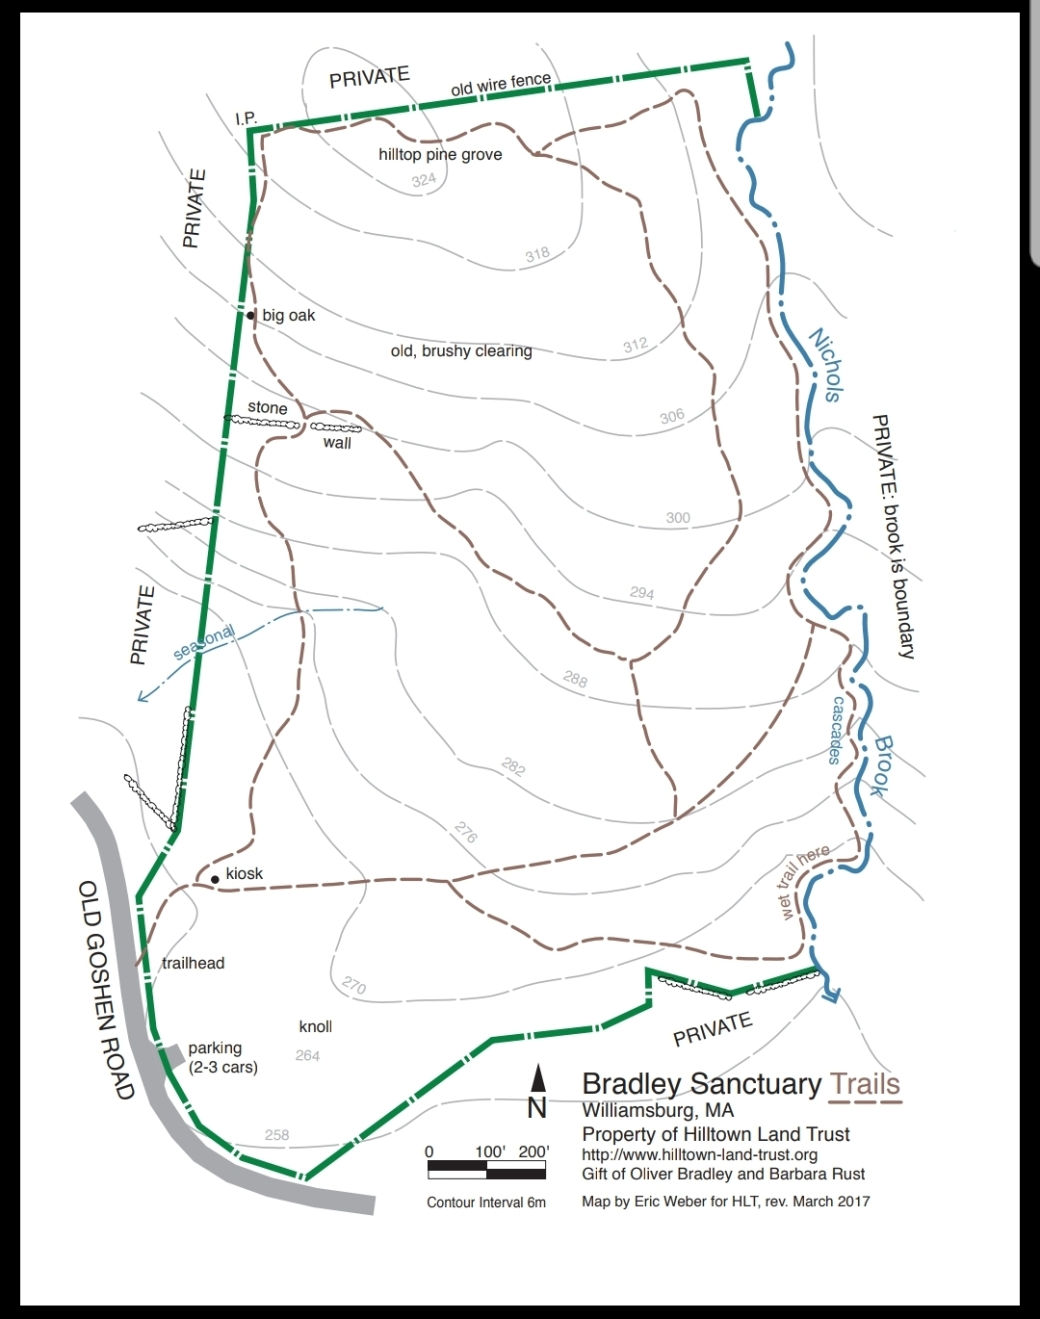 Bradley Sanctuary Williamsburg HLT